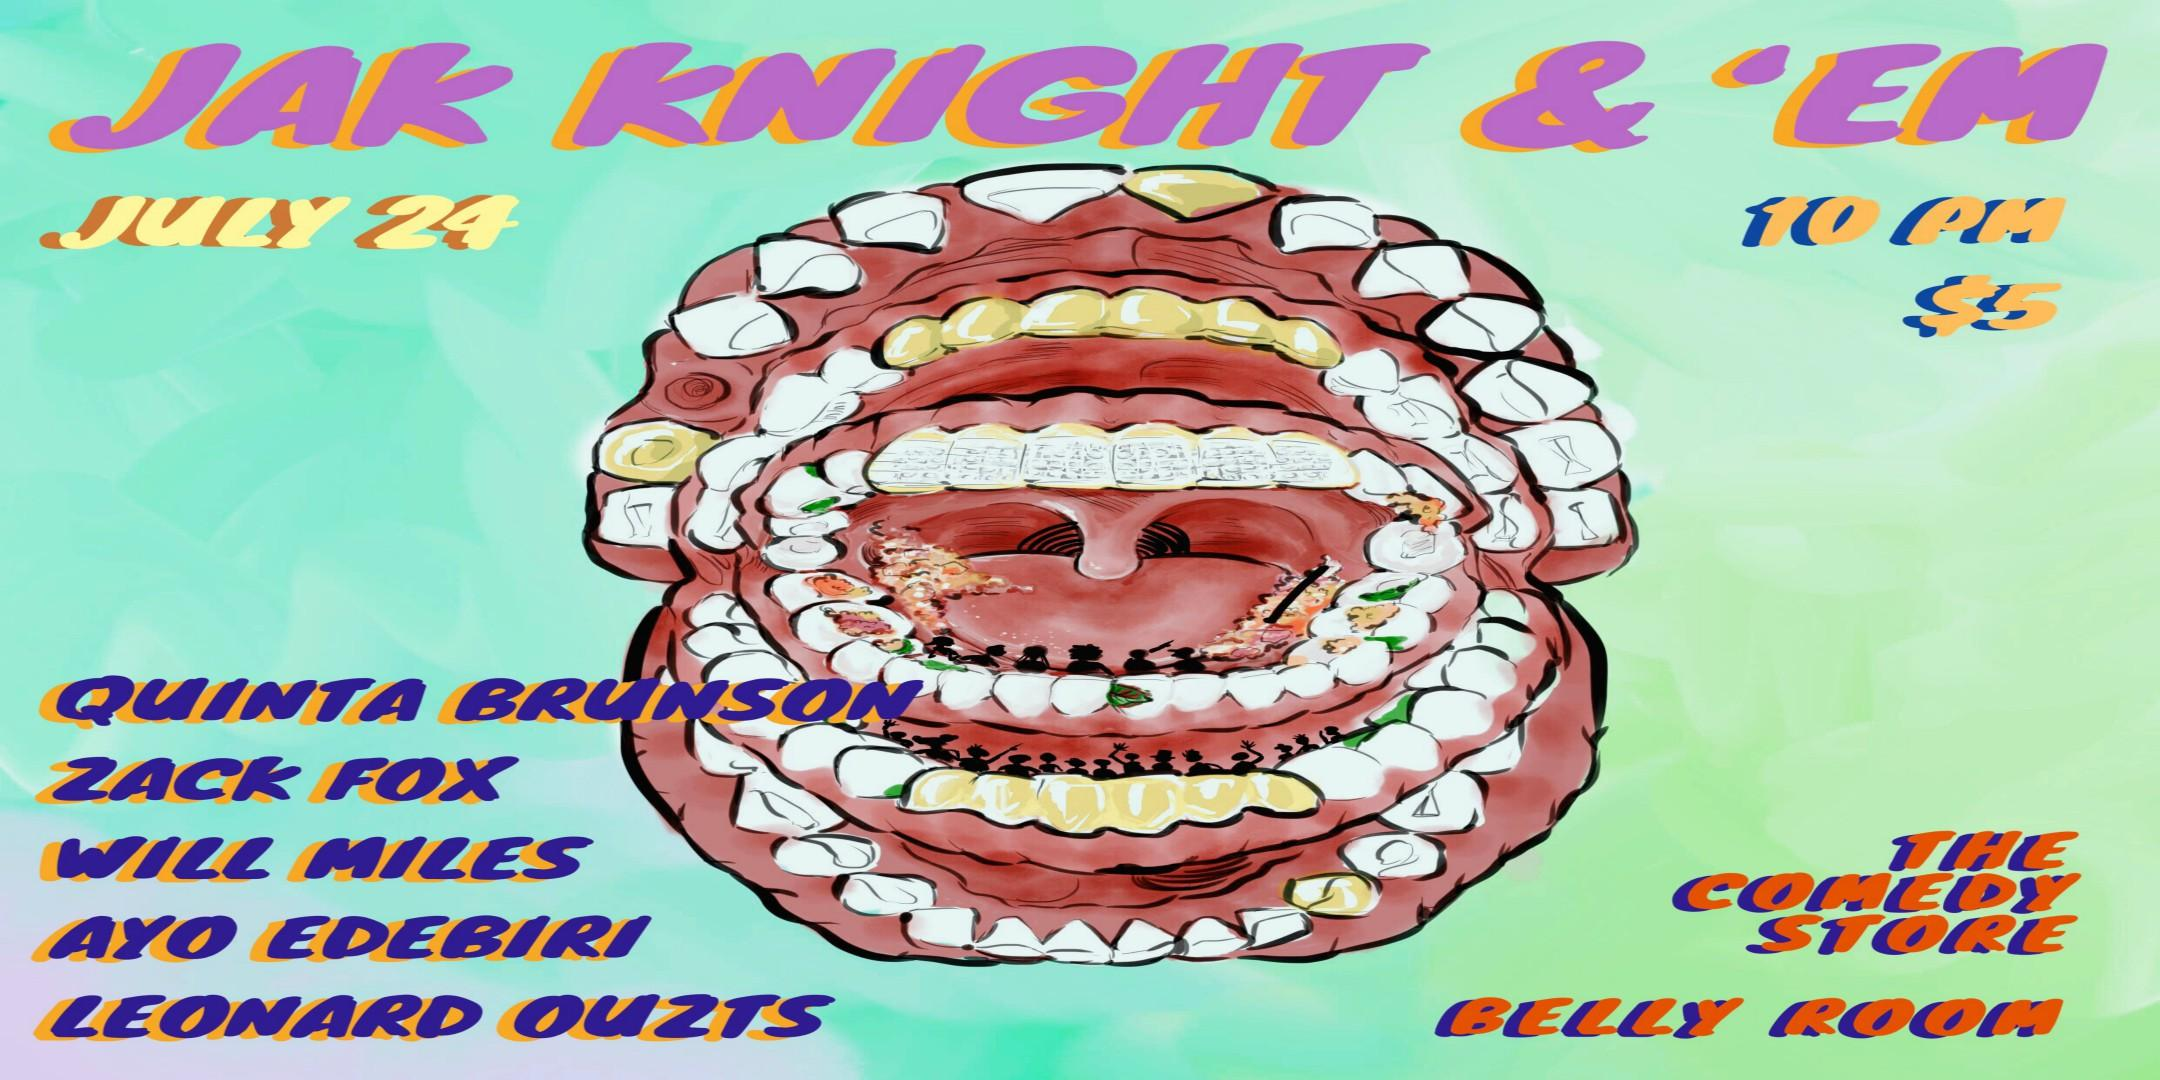 Jak Knight &